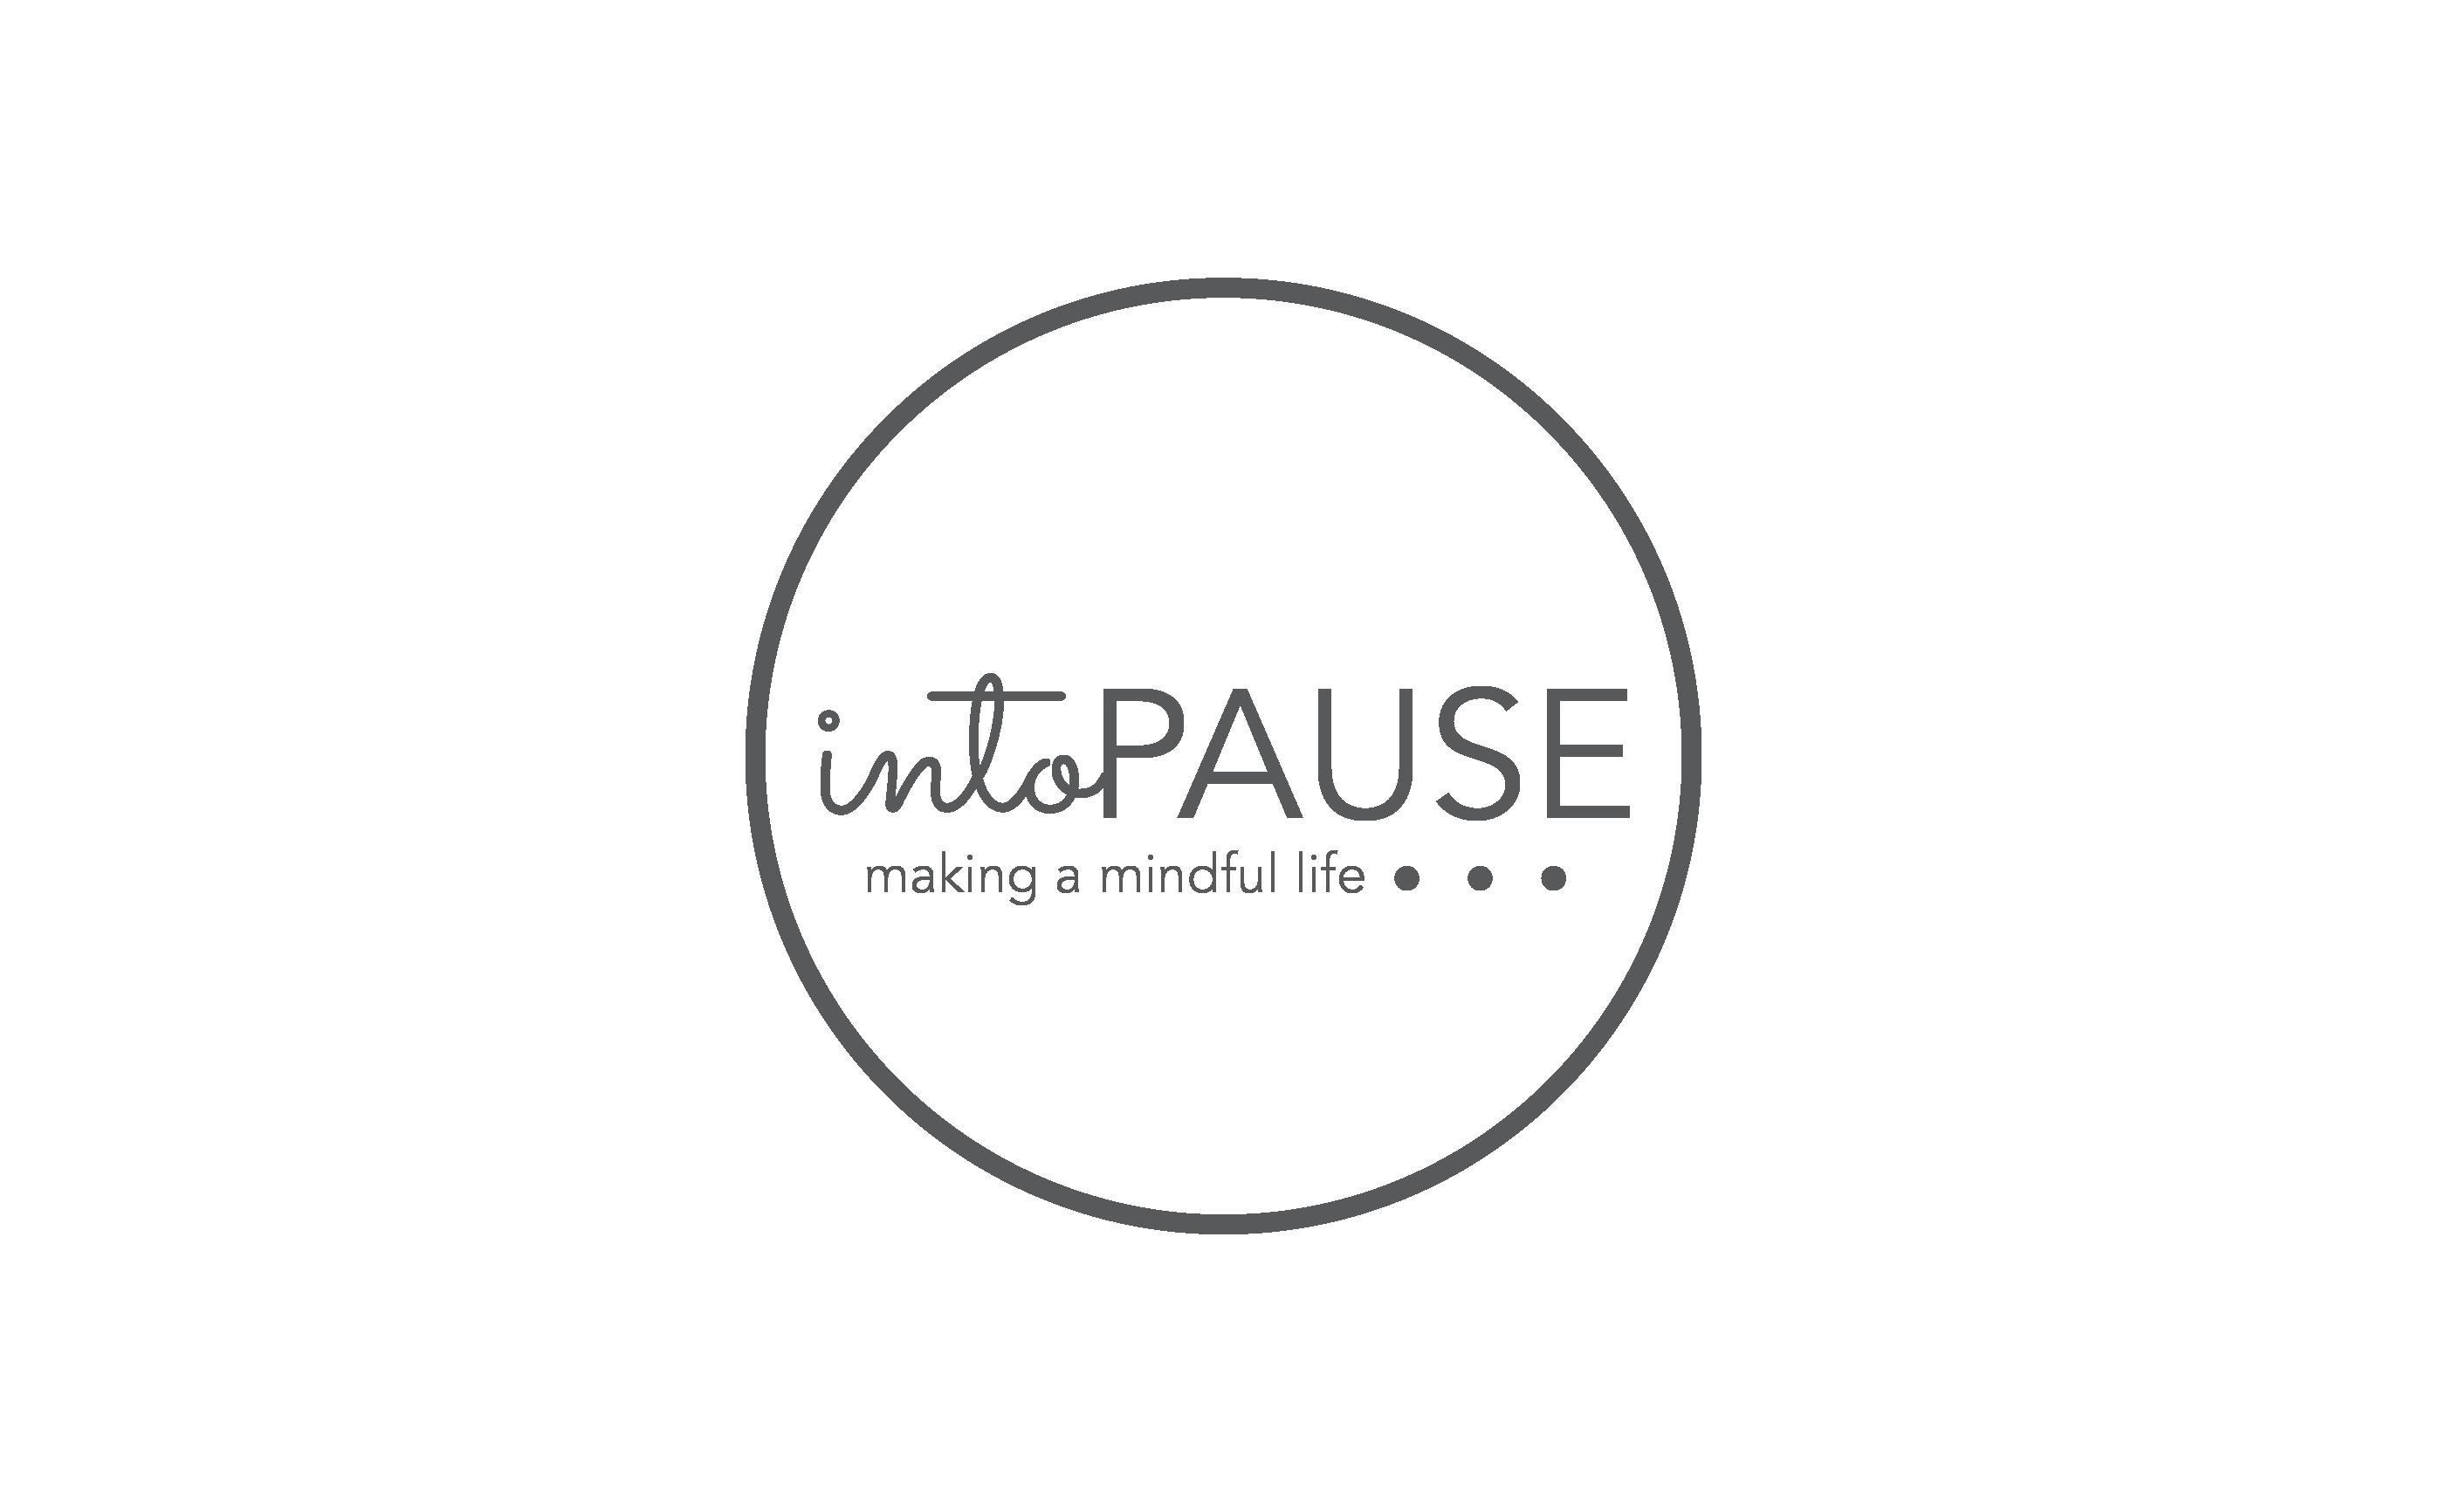 Kooperation mit The Pause Project - Making Kindful Classrooms | lehrerschueler.de